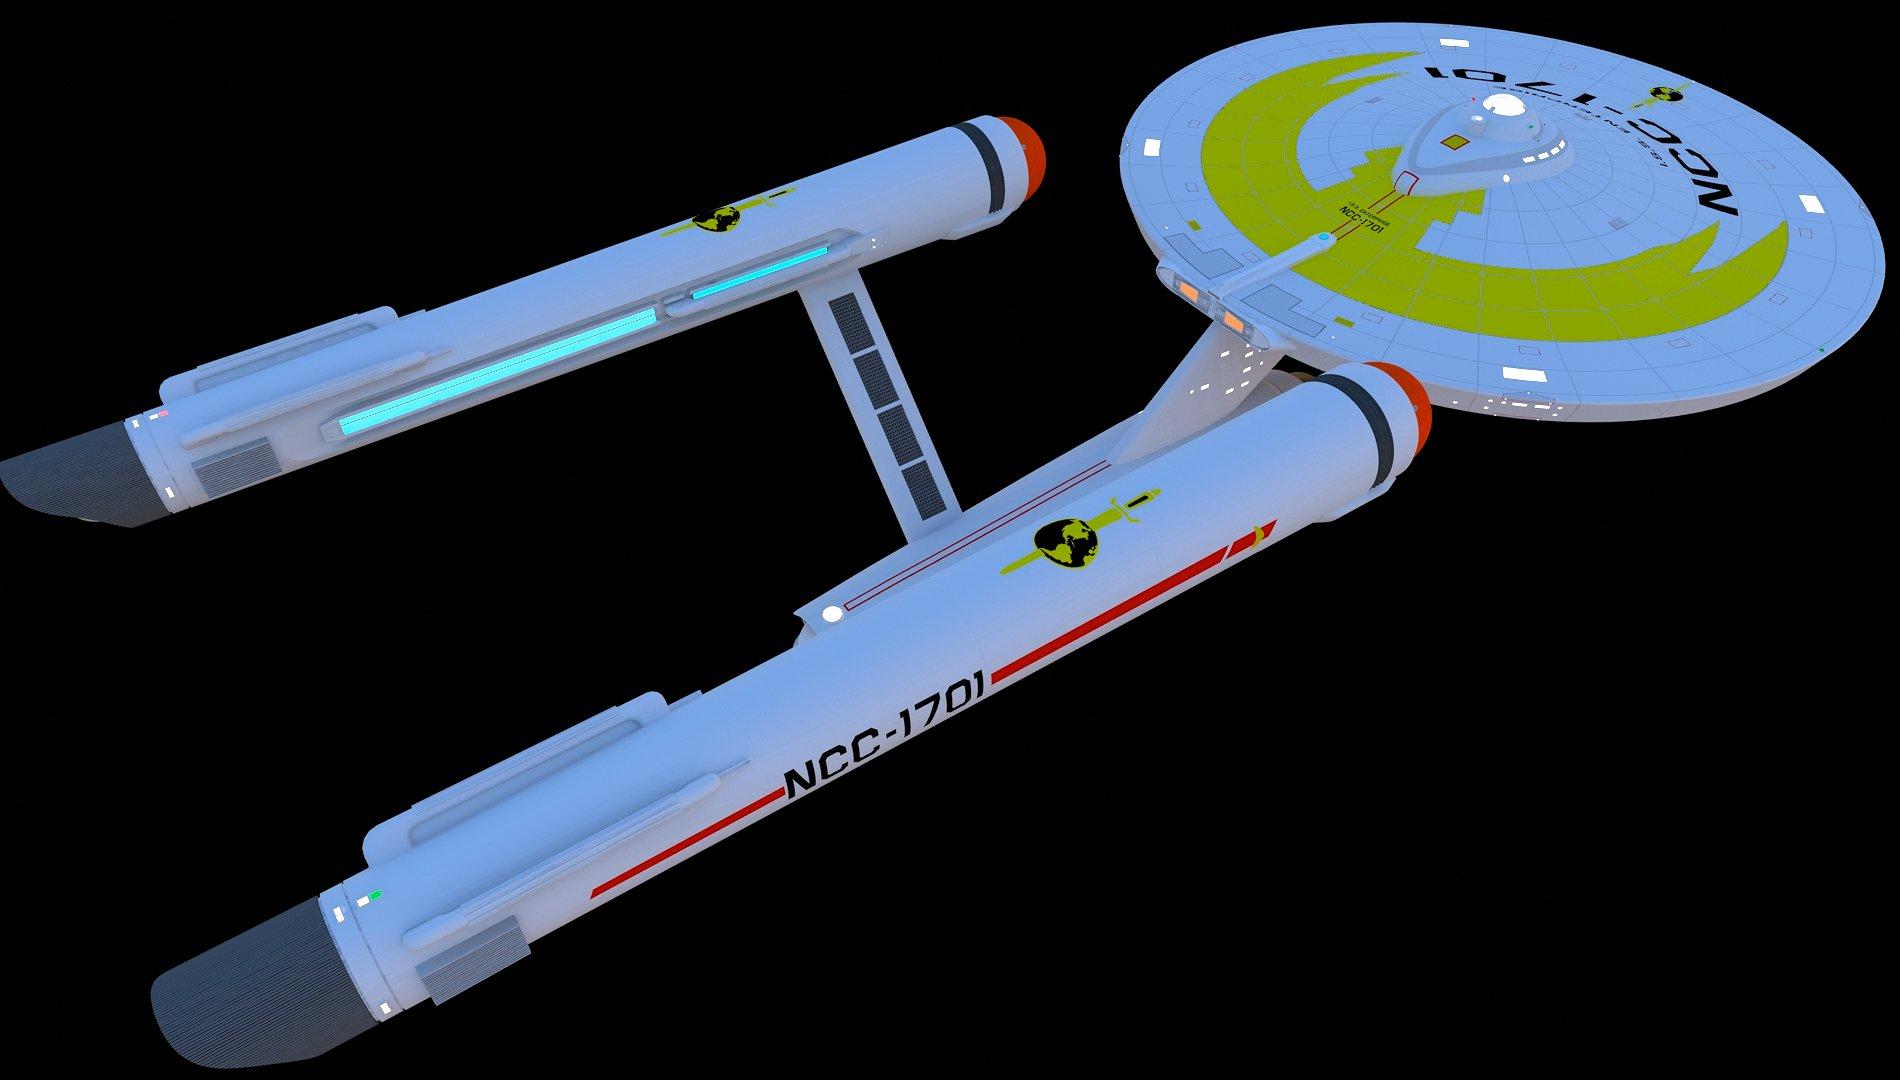 ISS Enterprise by Greywolf-Starkiller